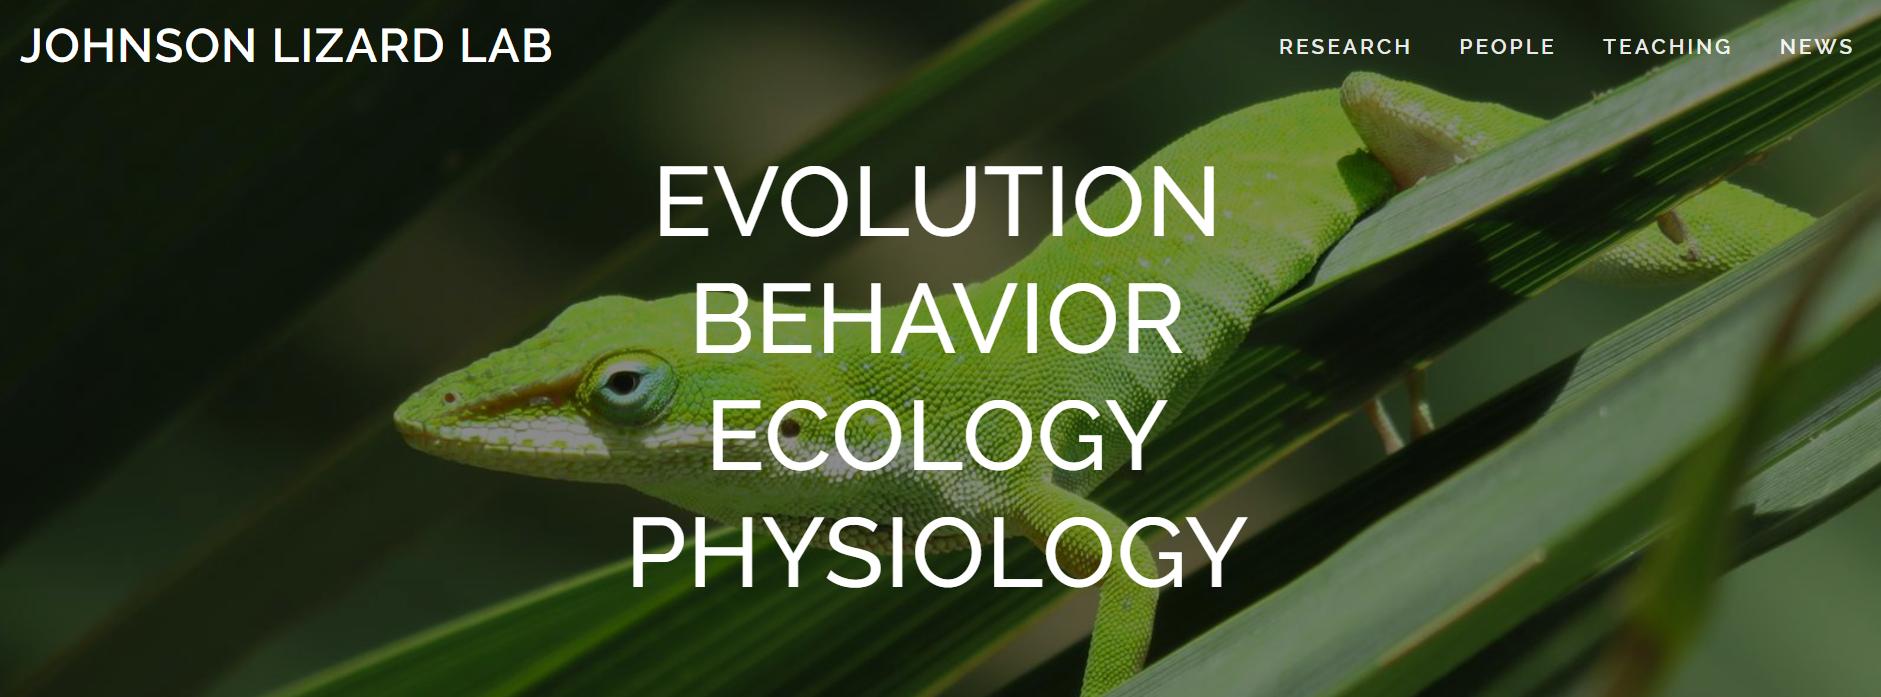 Lizard Lab Homepage